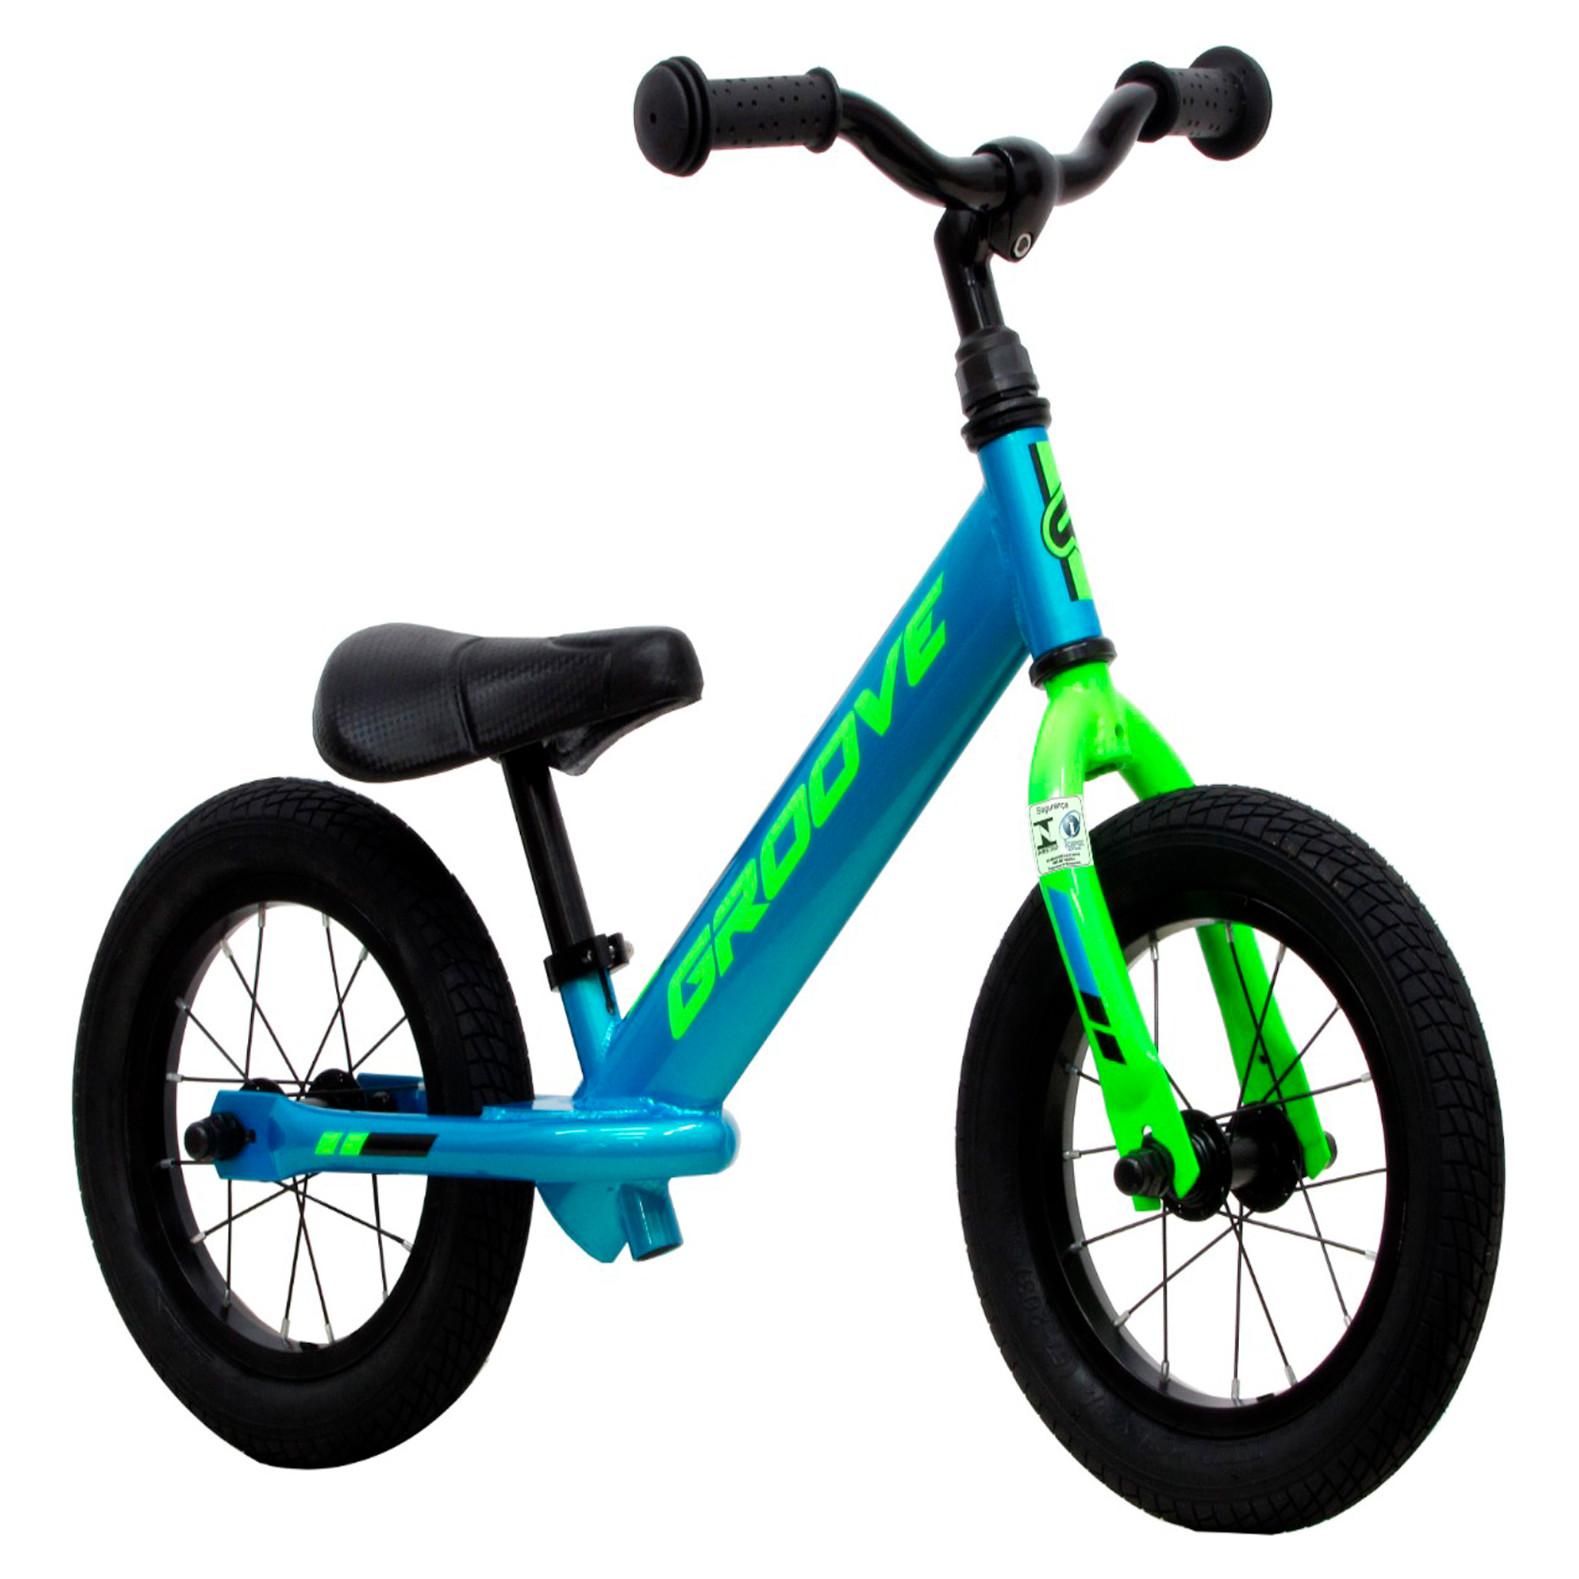 Bicicleta Infantil Groove Balance aro 12 2020